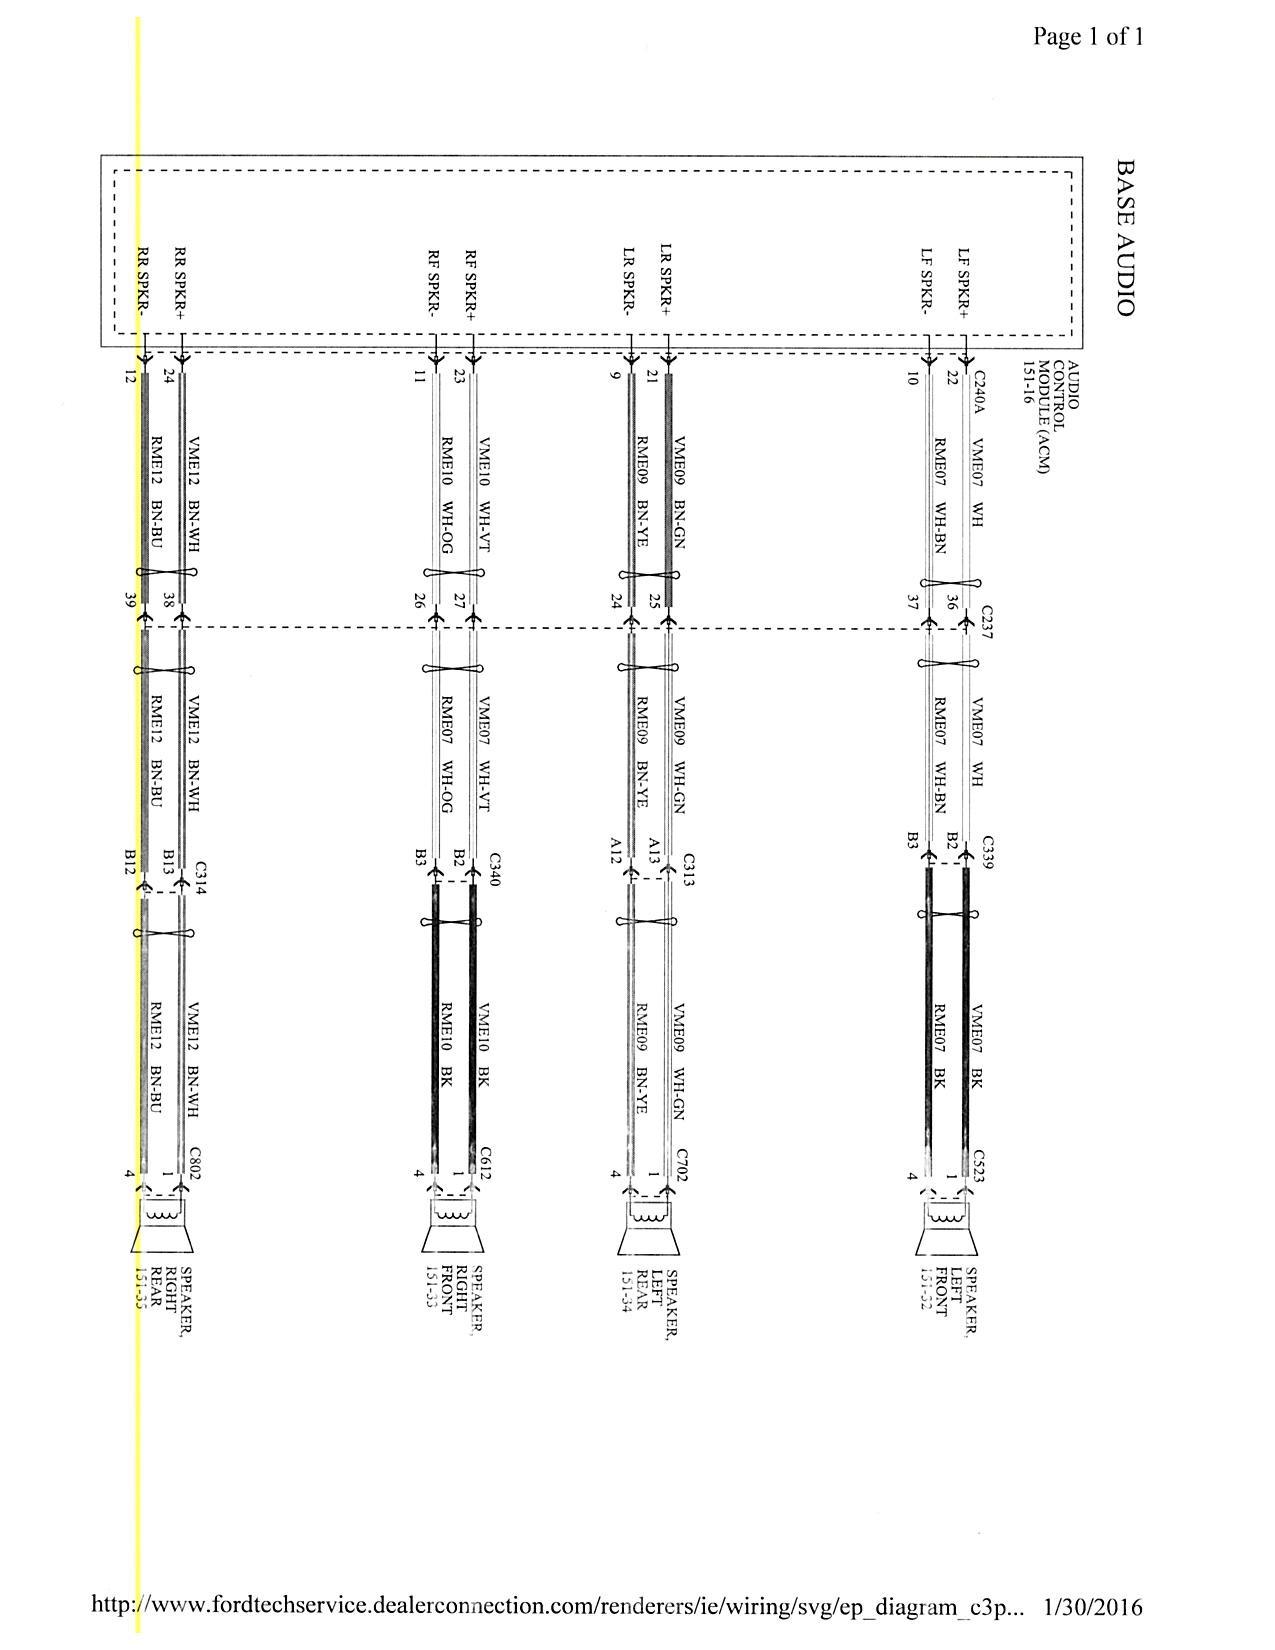 ford focus sync wiring diagram